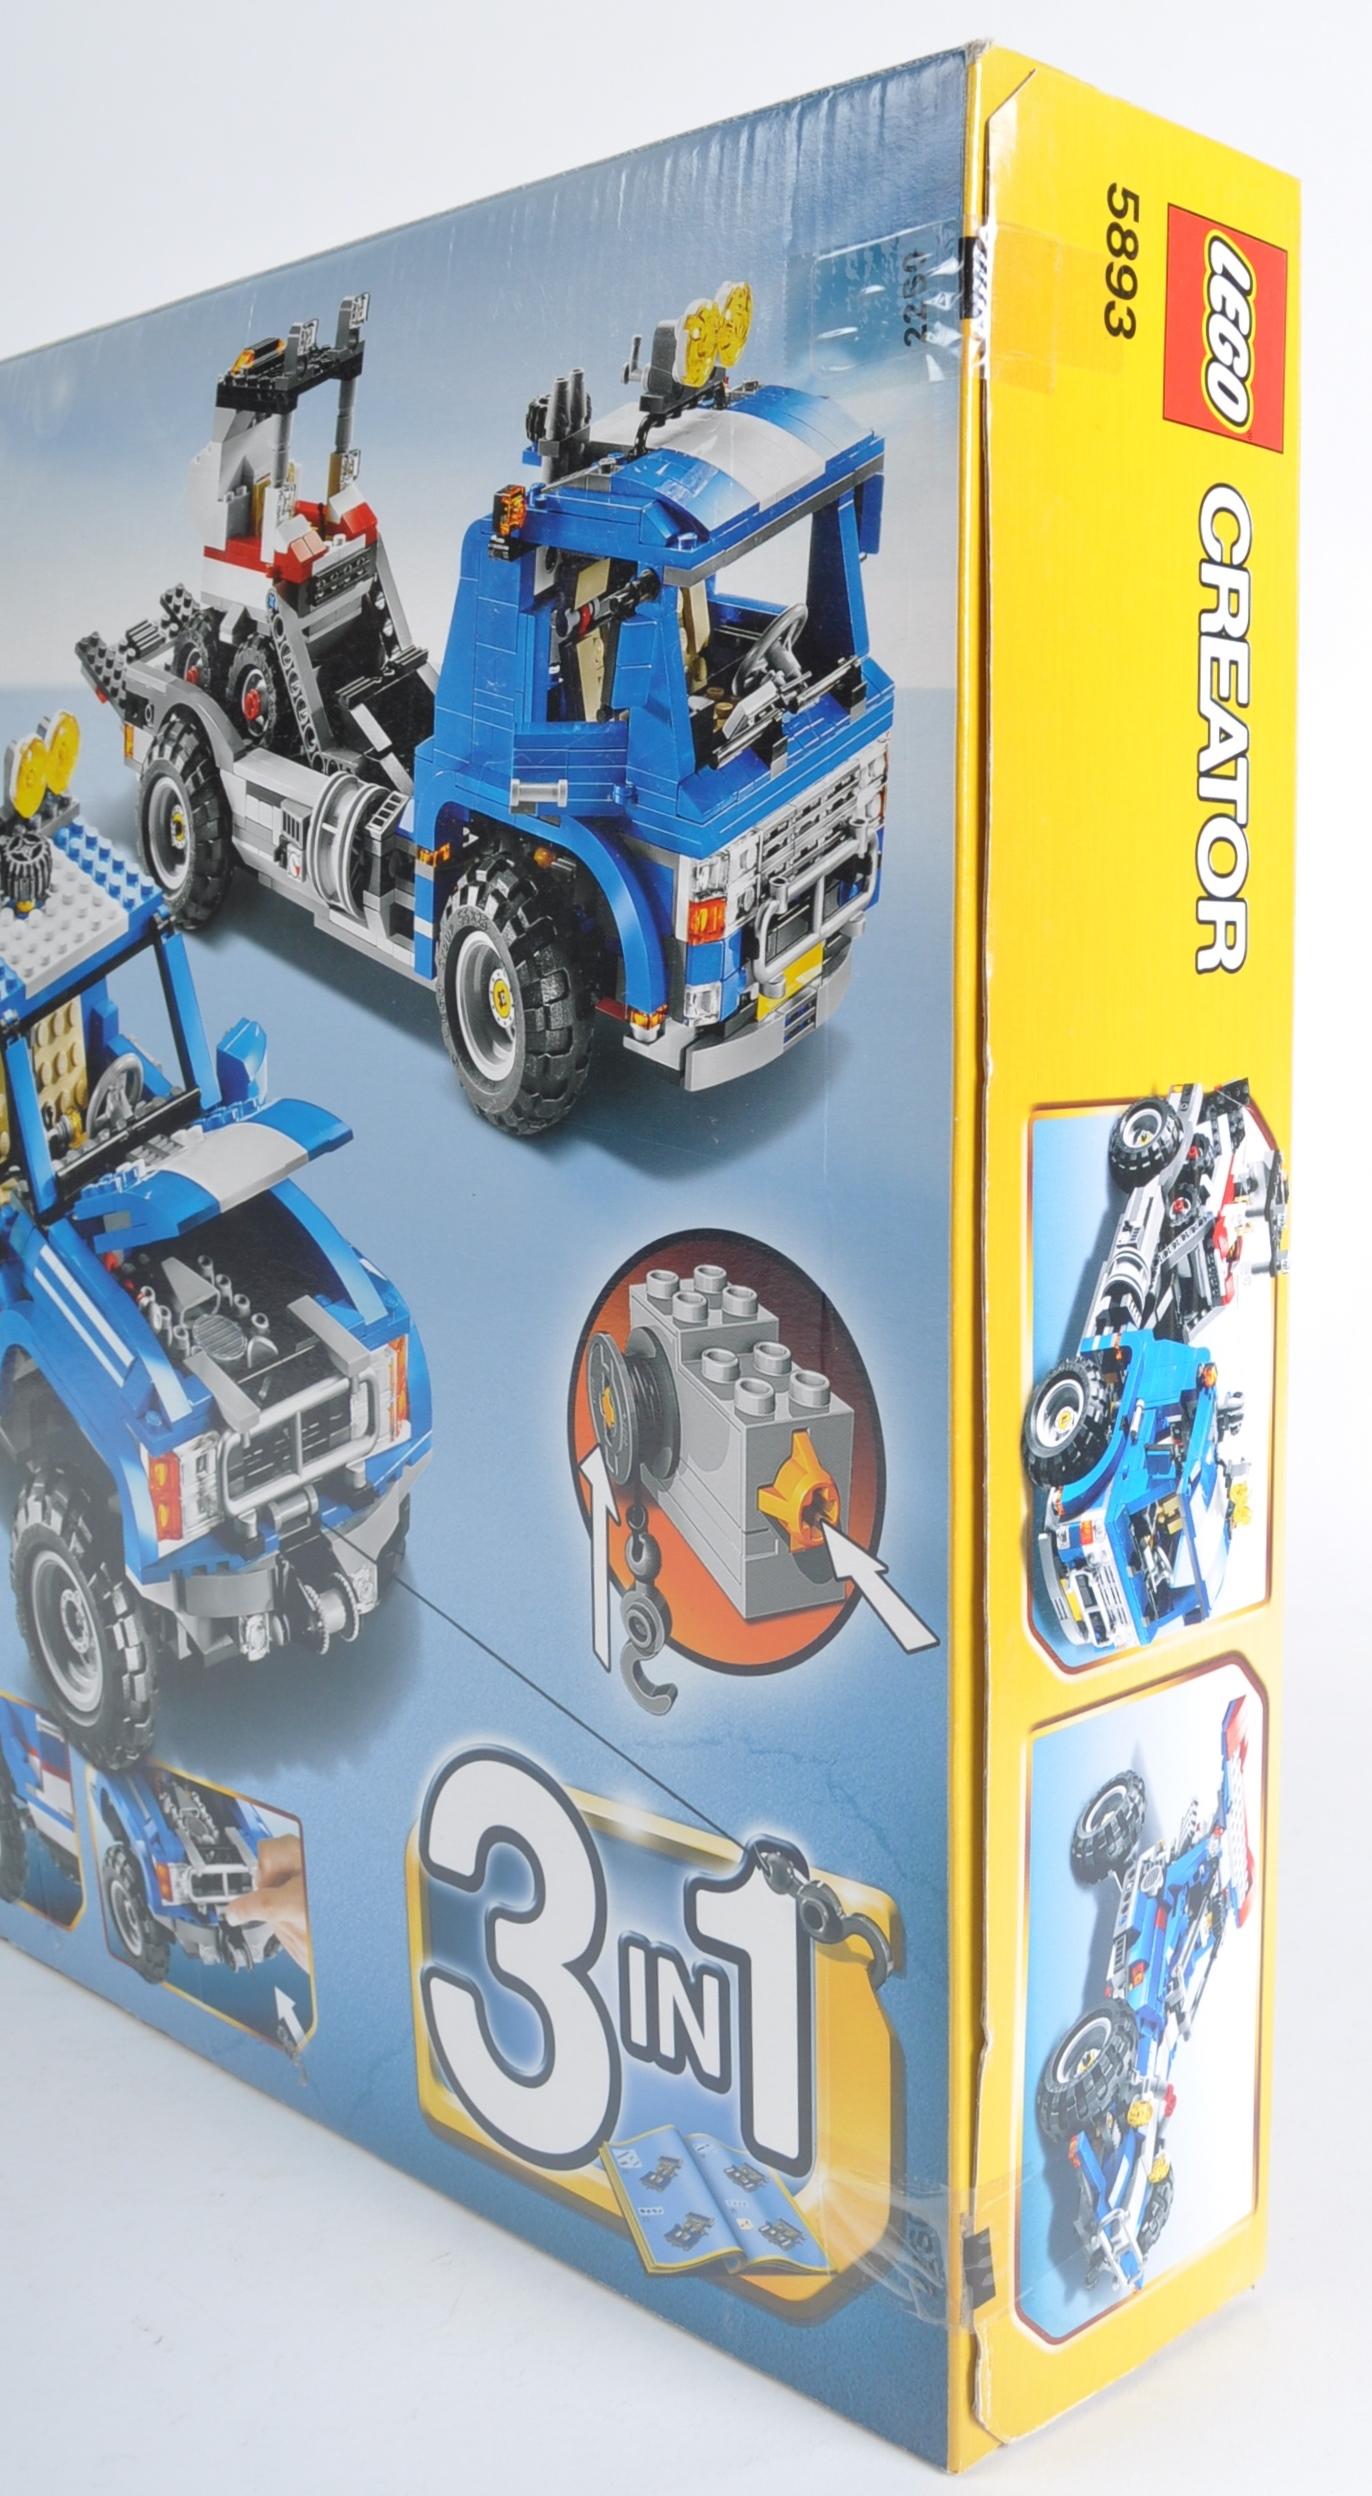 LEGO SET - LEGO CREATOR - 5893 - OFF ROAD POWER - Image 3 of 4